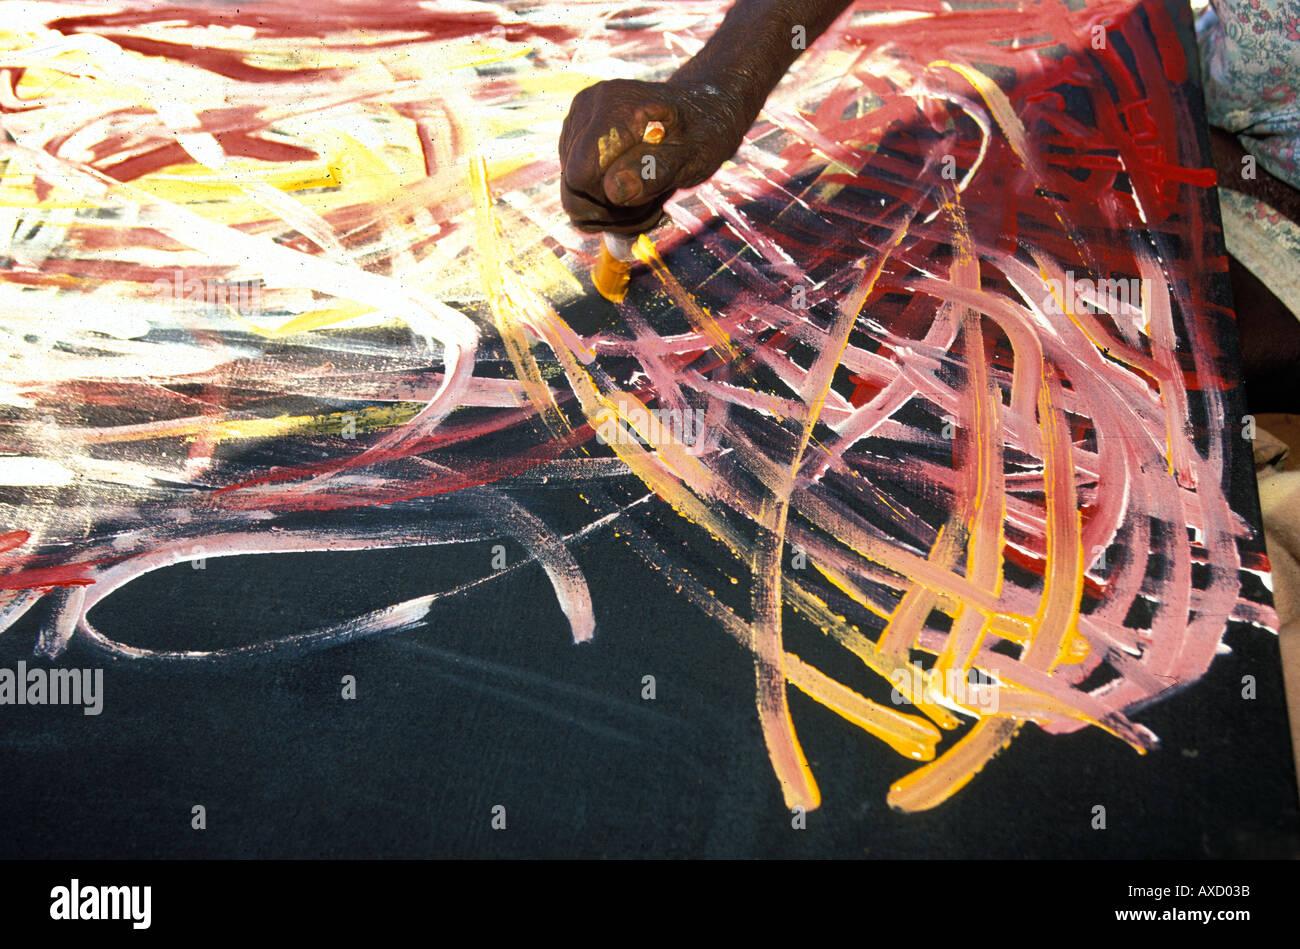 Art By Emily Kame Kngwarreye Famous Aboriginal Artist At Utopia